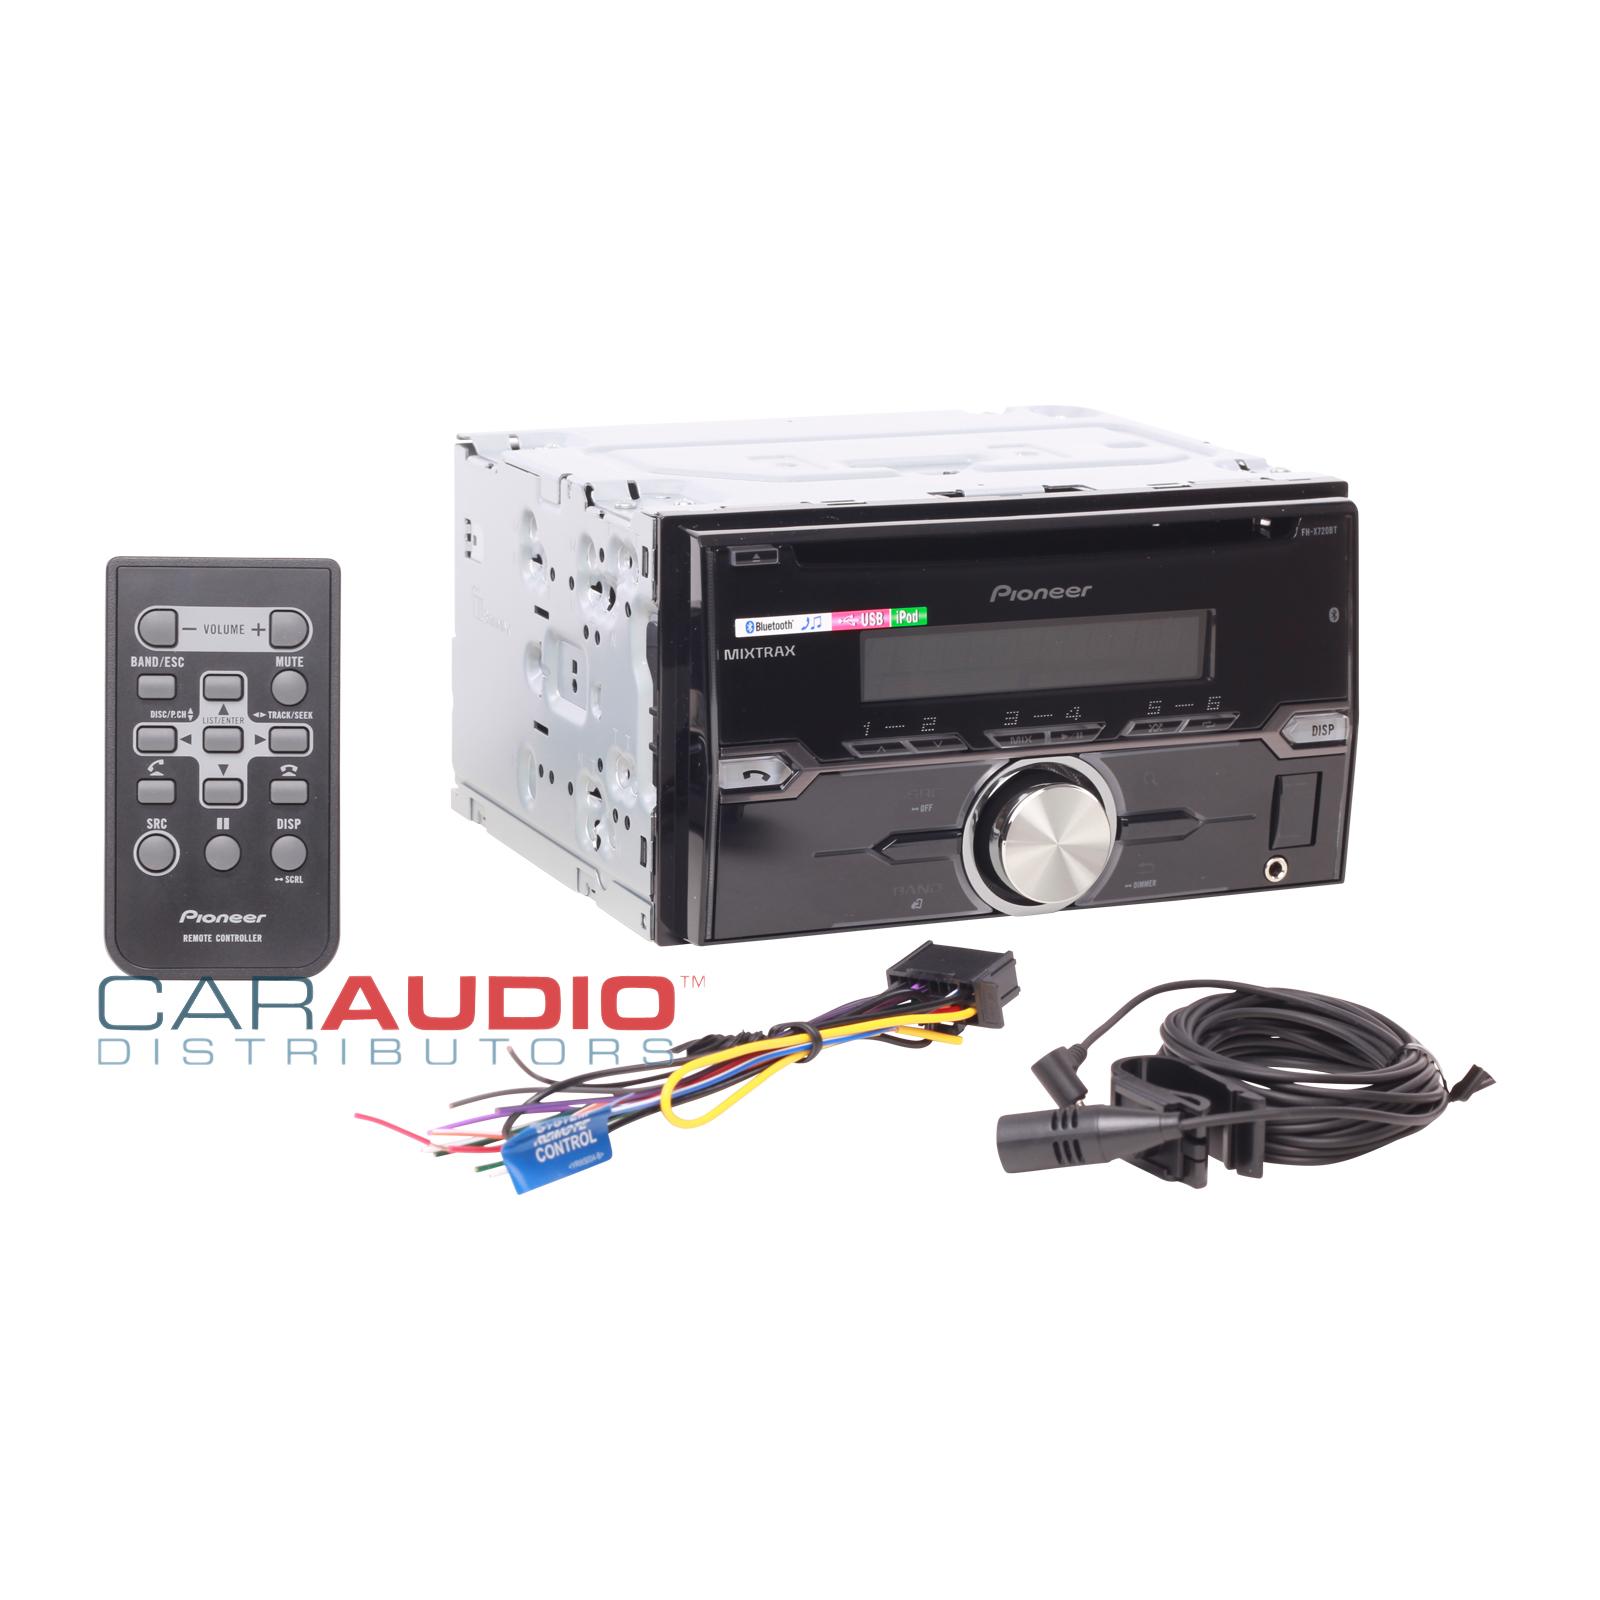 pioneer fh x720bt be nungsanleitung deutsch 2004 ford ranger wiring diagram new in dash car stereo double din cd mp3